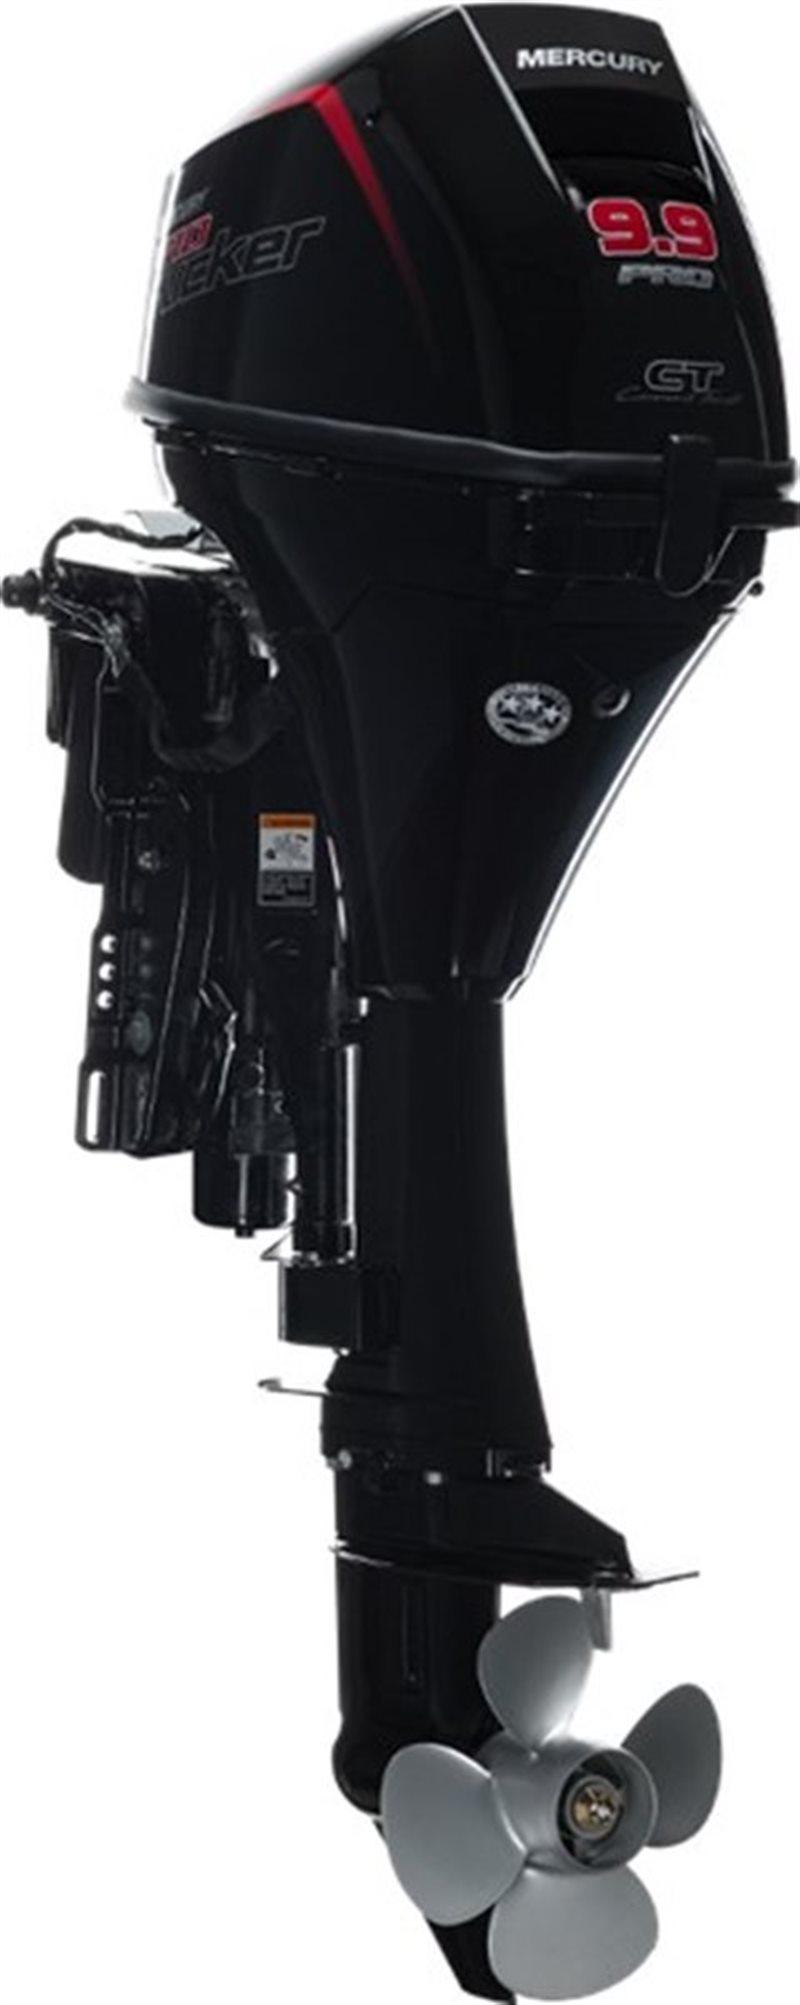 99 hp EFI ProKicker at Fort Fremont Marine